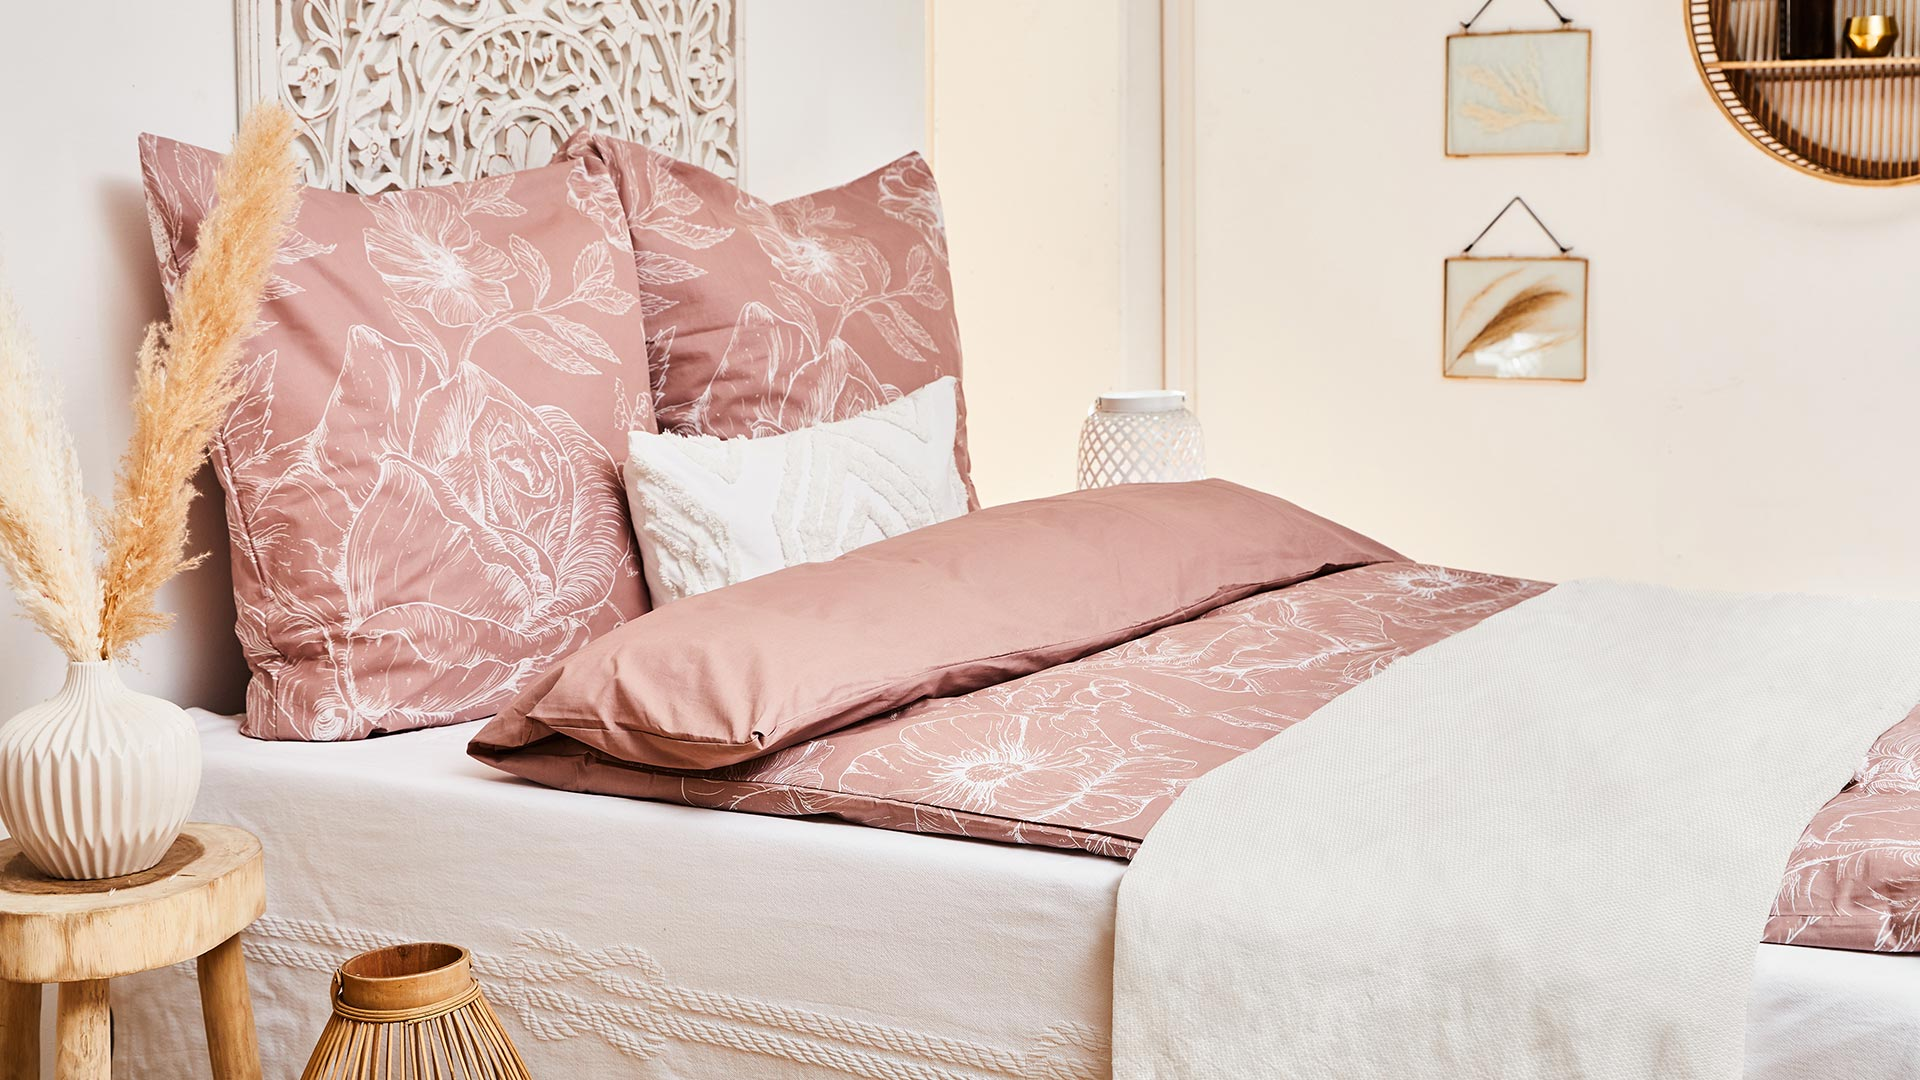 Bett-Styling: Pink